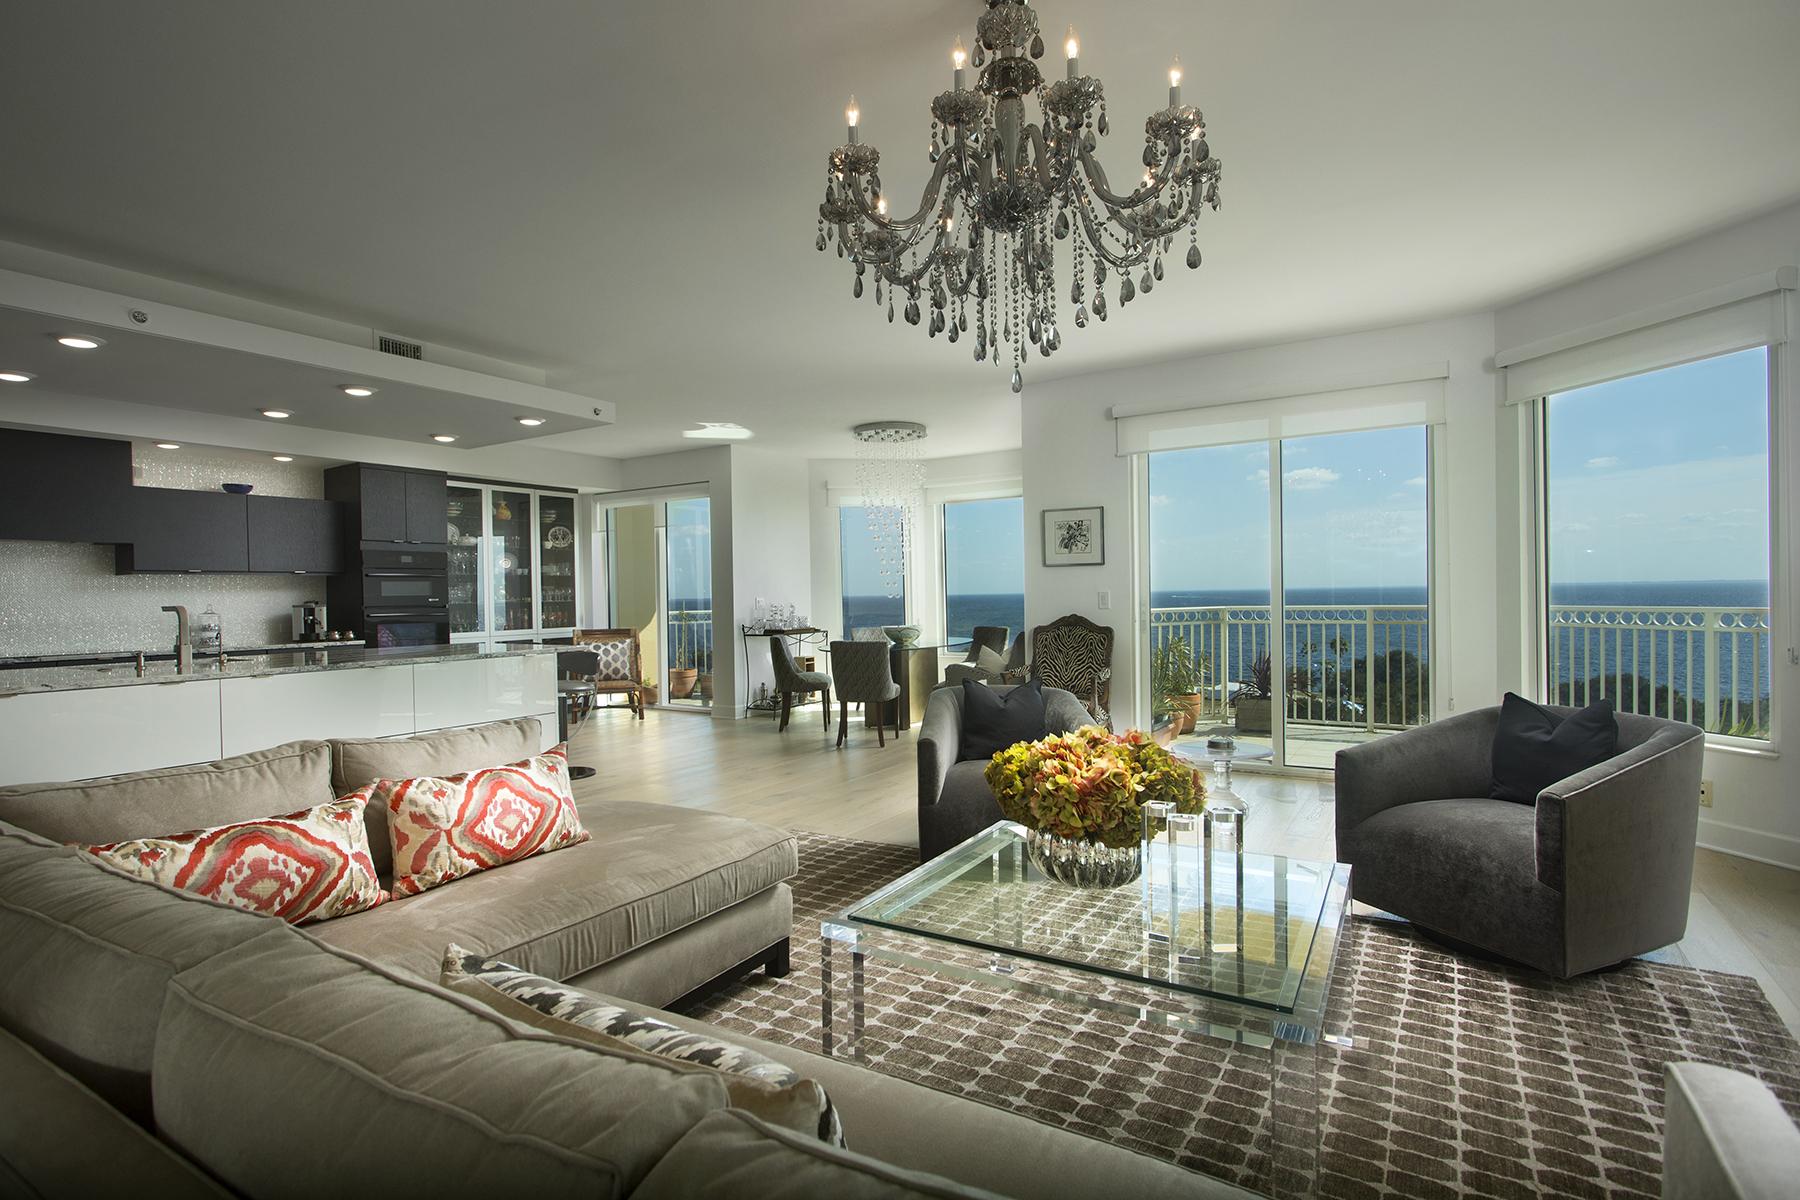 Condomínio para Venda às DOWNTOWN ST. PETE 555 5th Ave NE 824 St. Petersburg, Florida, 33701 Estados Unidos